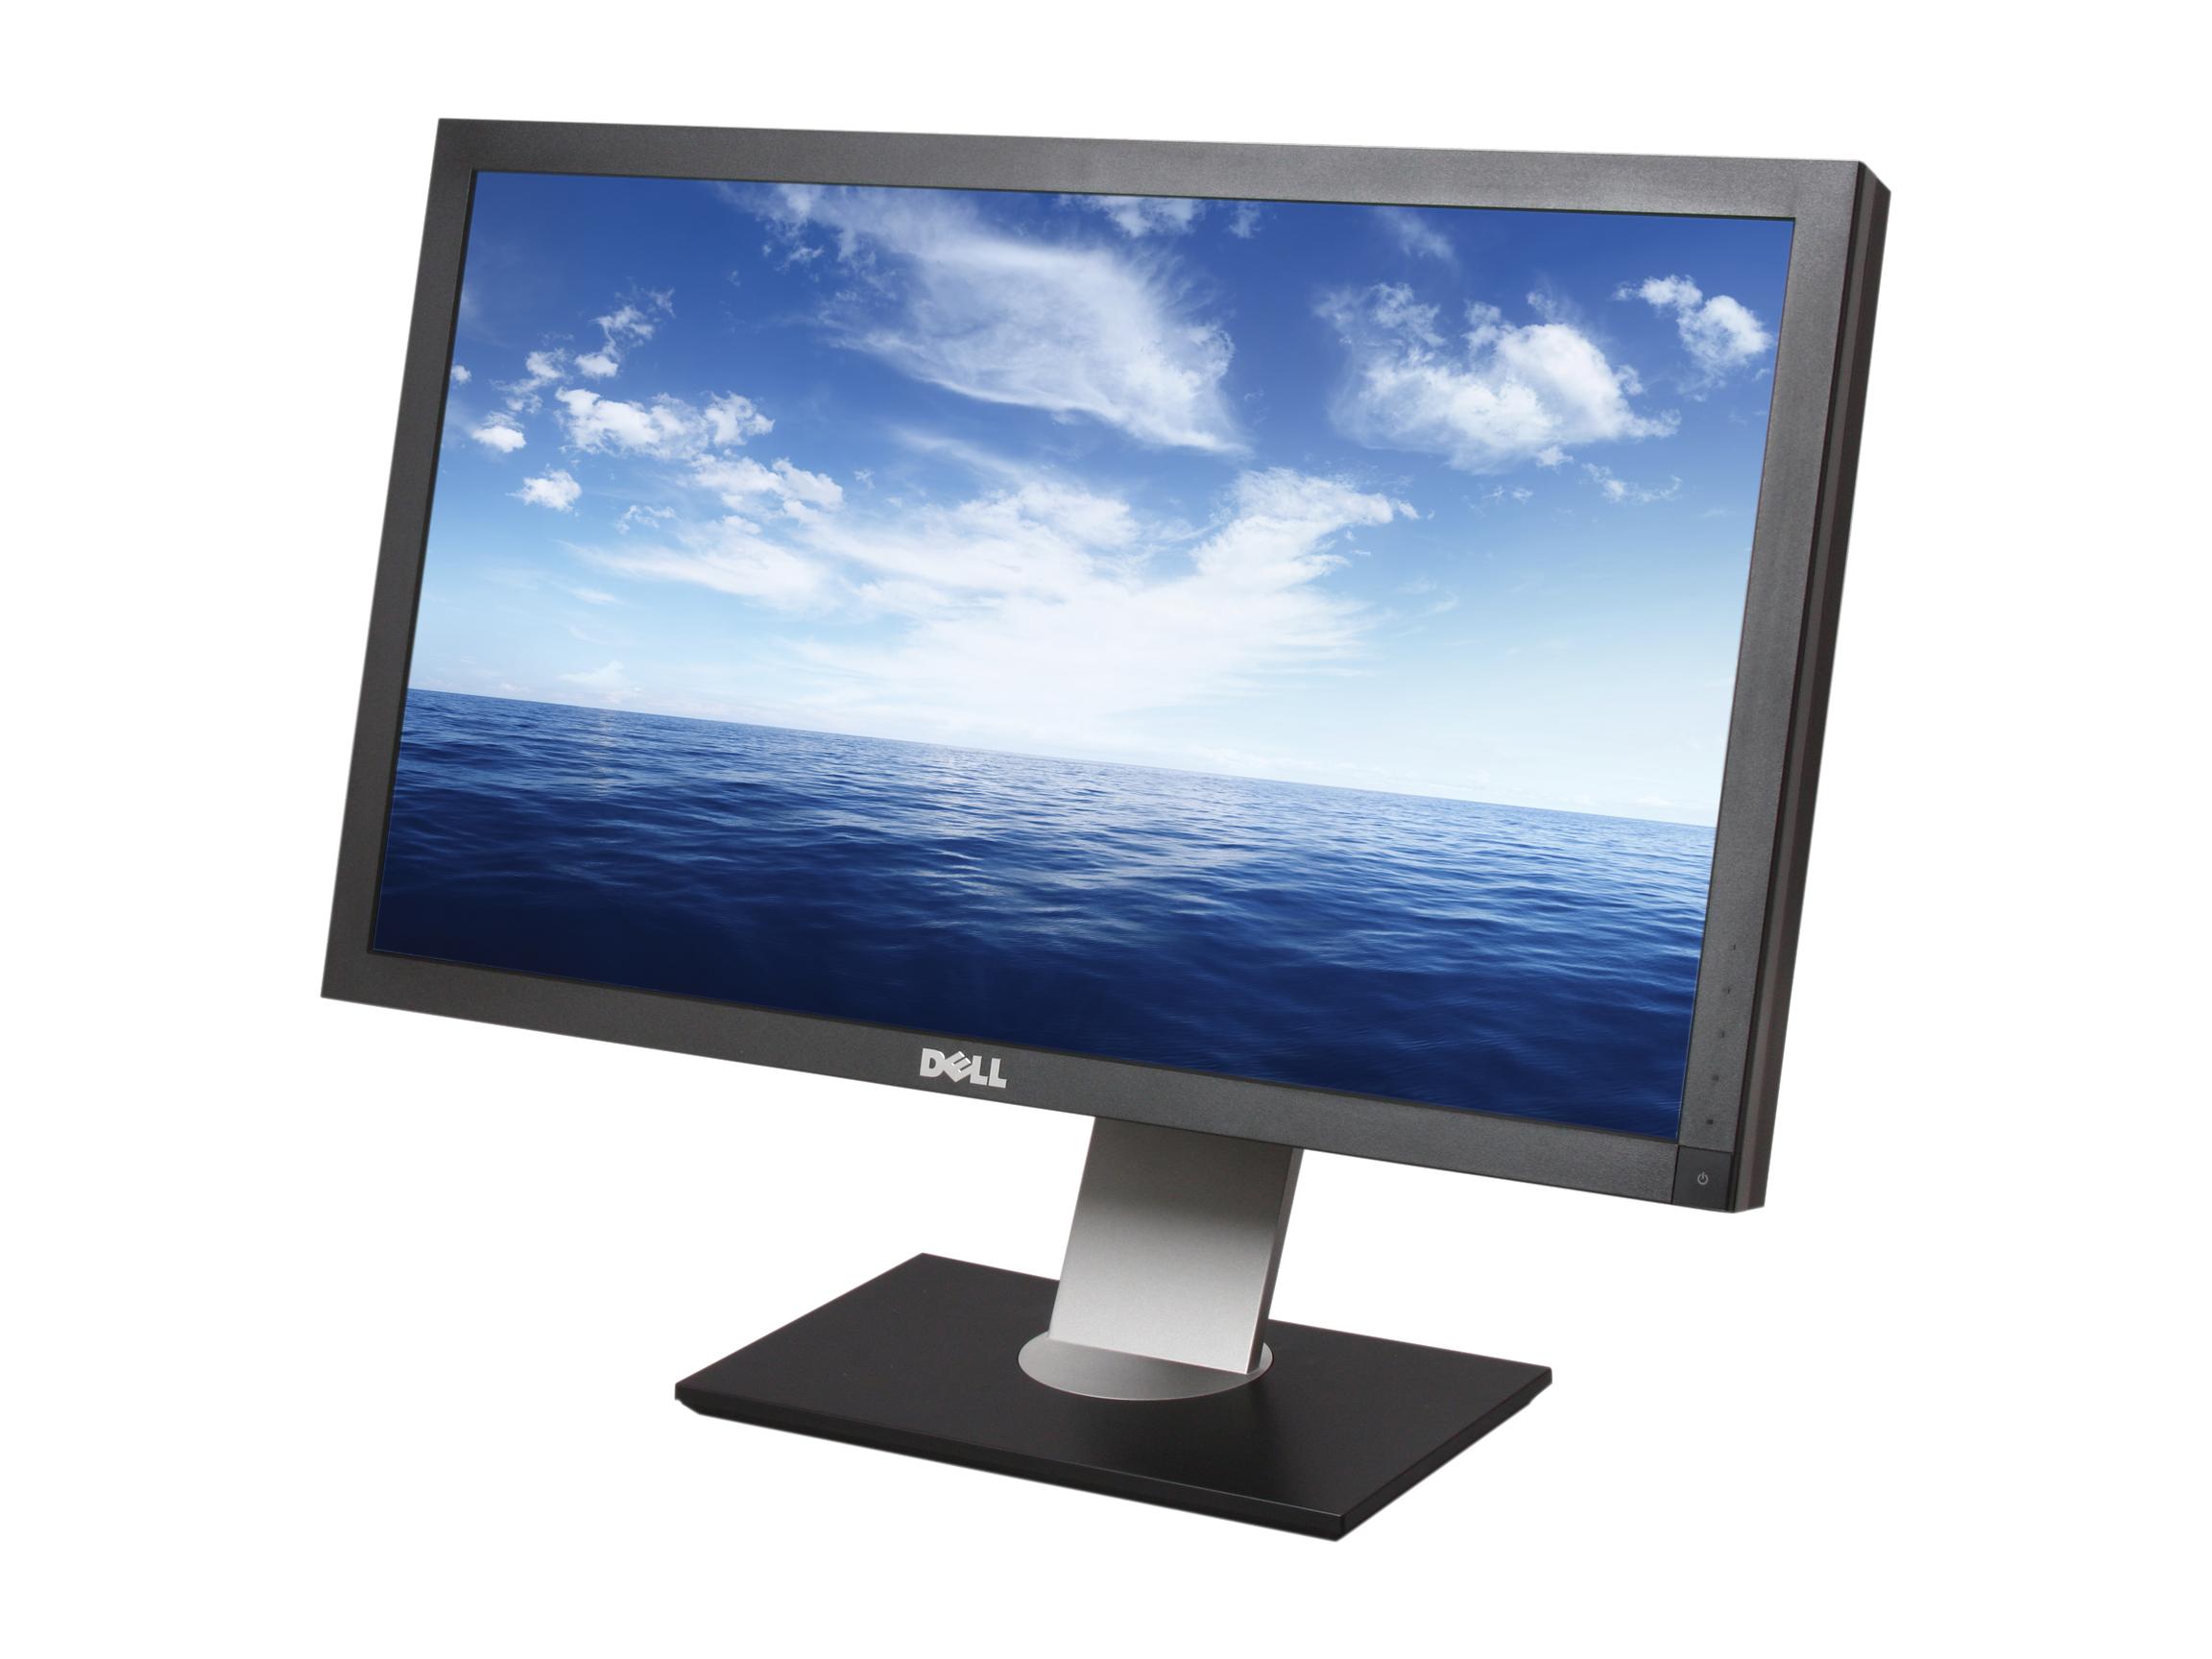 "Dell UltraSharp U2711 IPS Panel Black 27"" 6ms WQHD HDMI Swivel & Height Adjustable Widescreen LCD Monitor with PremierColor 350 cd/m2 80000:1 (1000:1)"